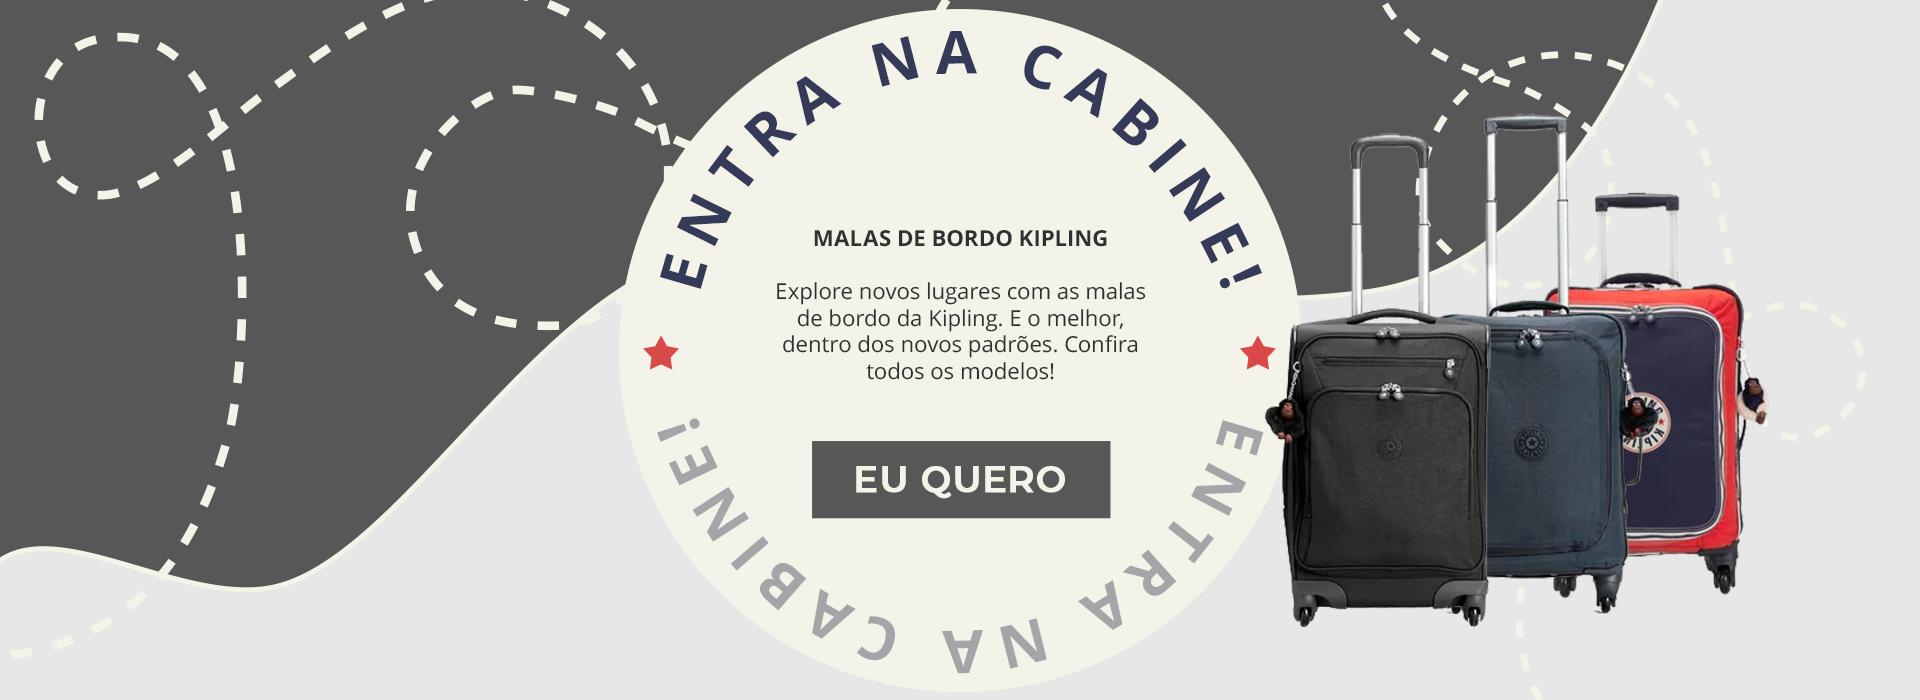 Banner 2 - Mala Bordo Kipling